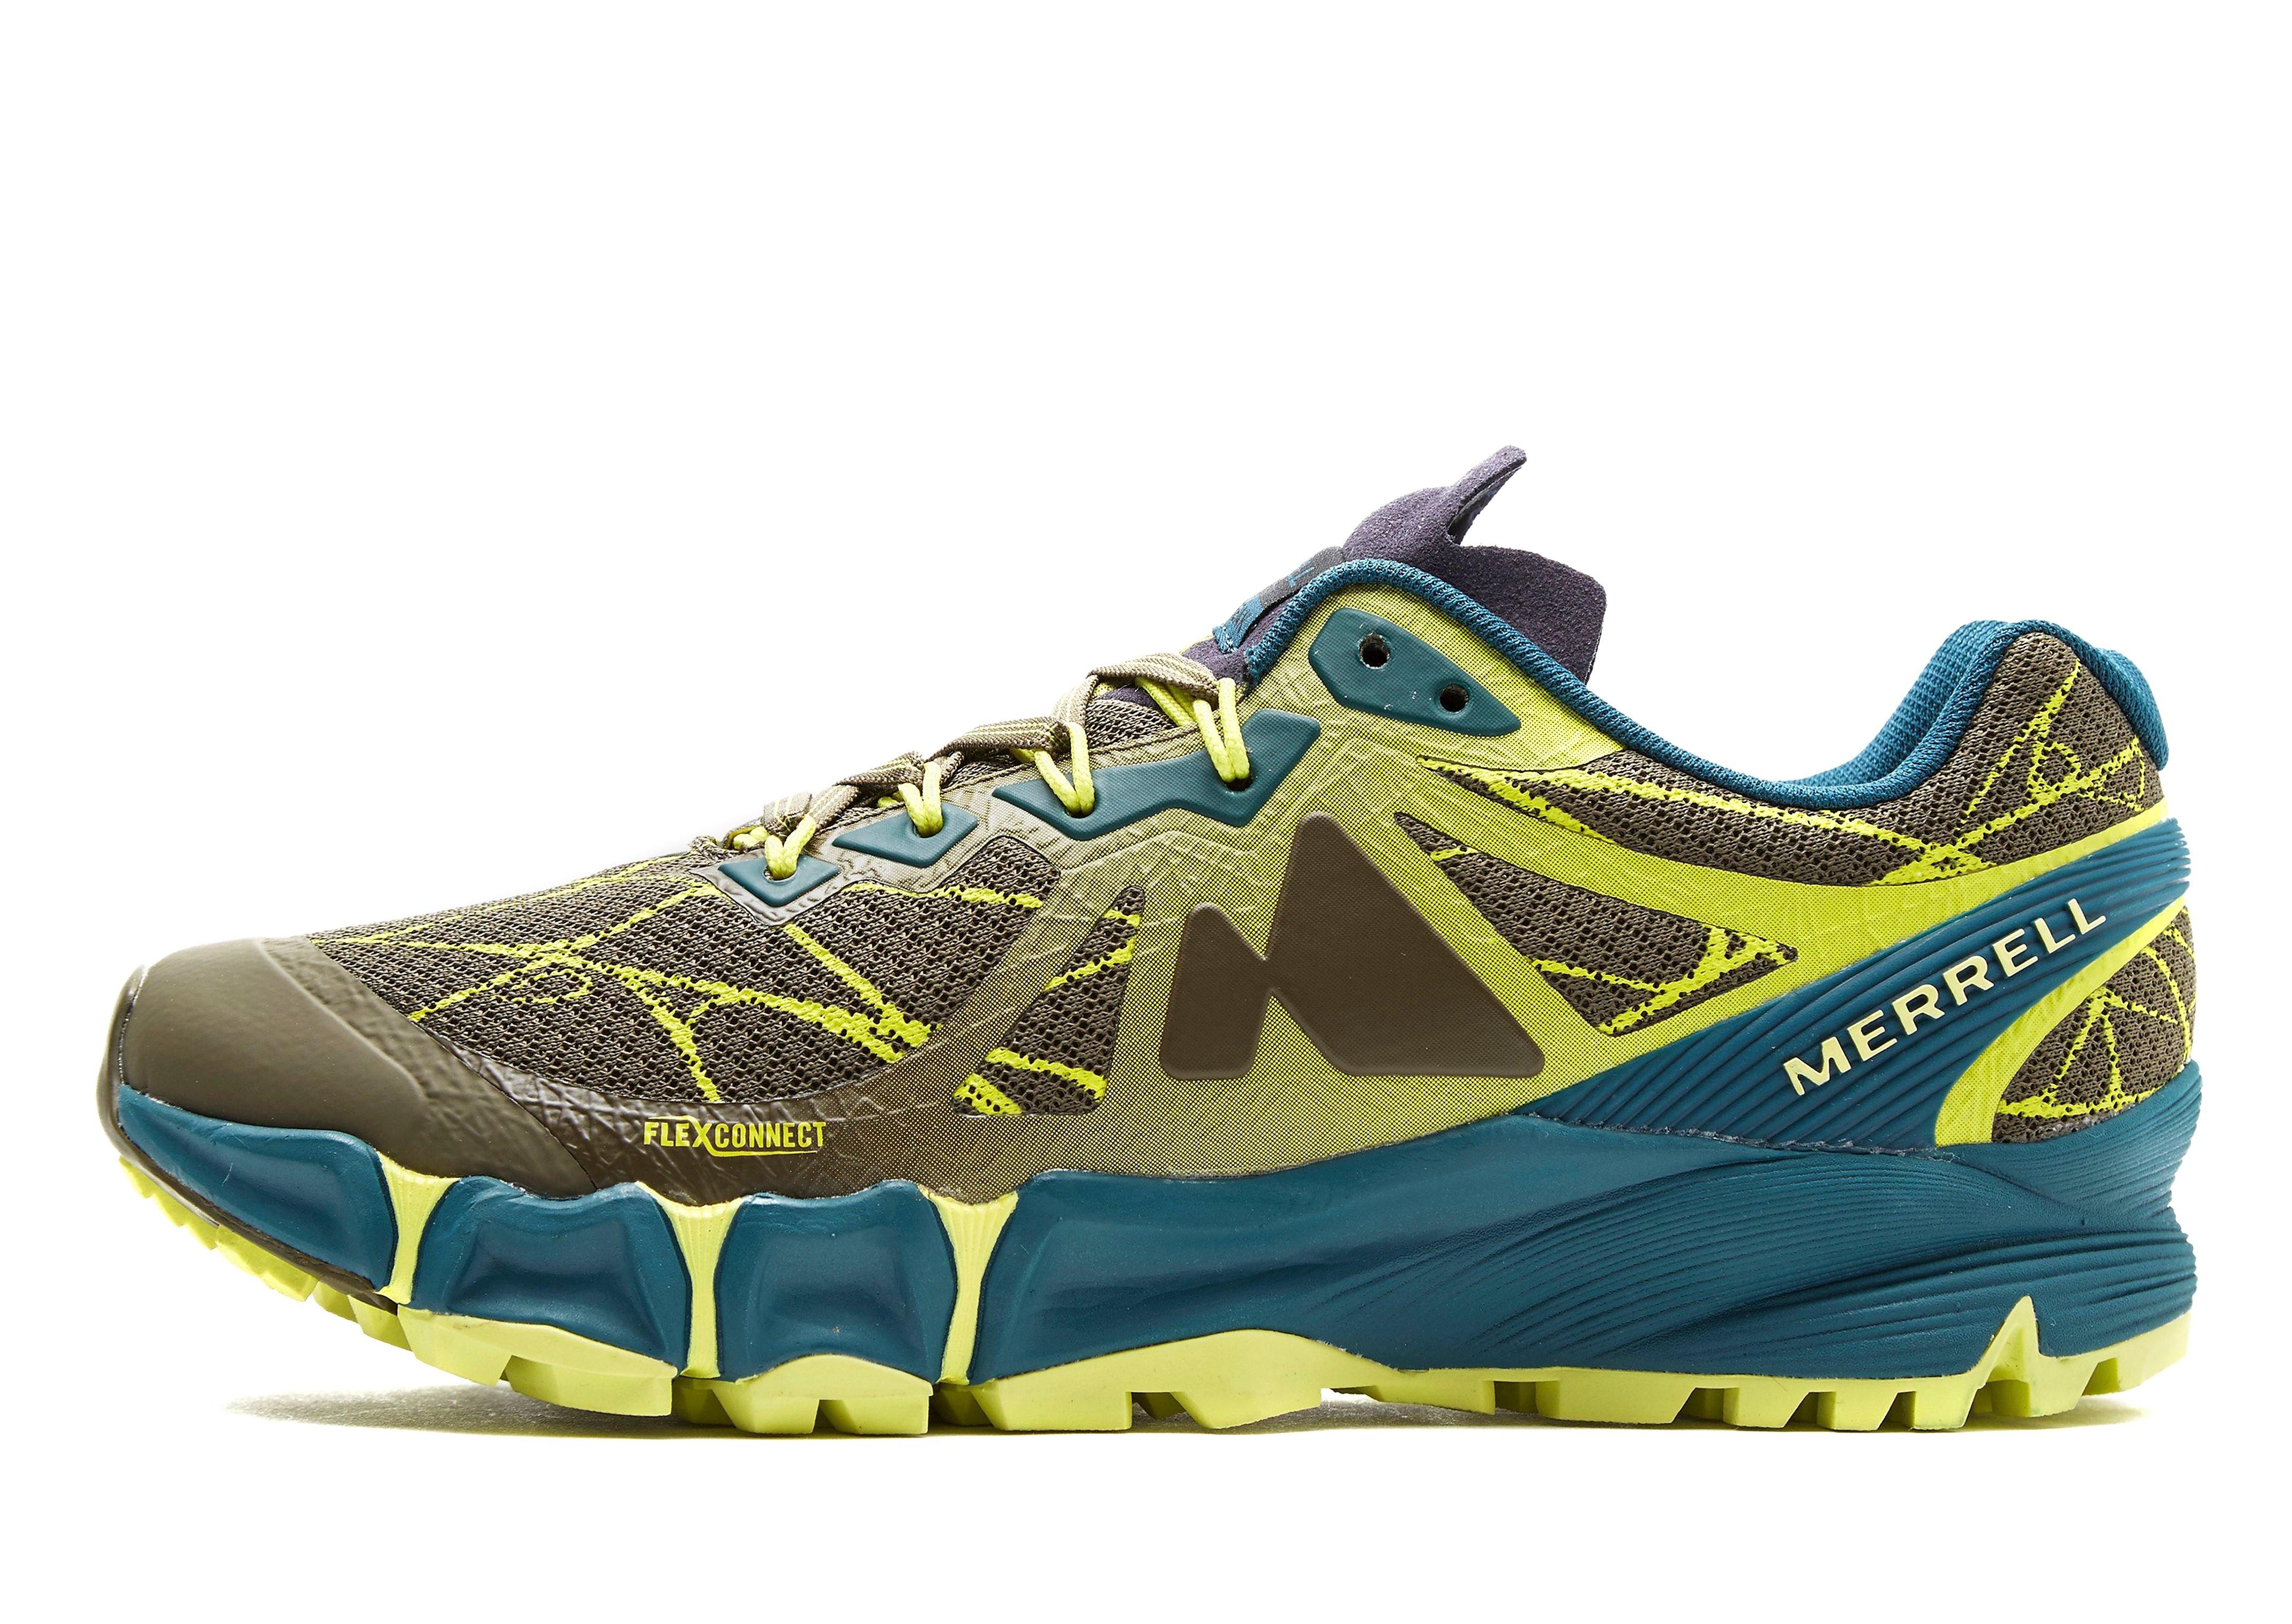 Merrell Agility Peak Flex Men's Trail Running Shoes